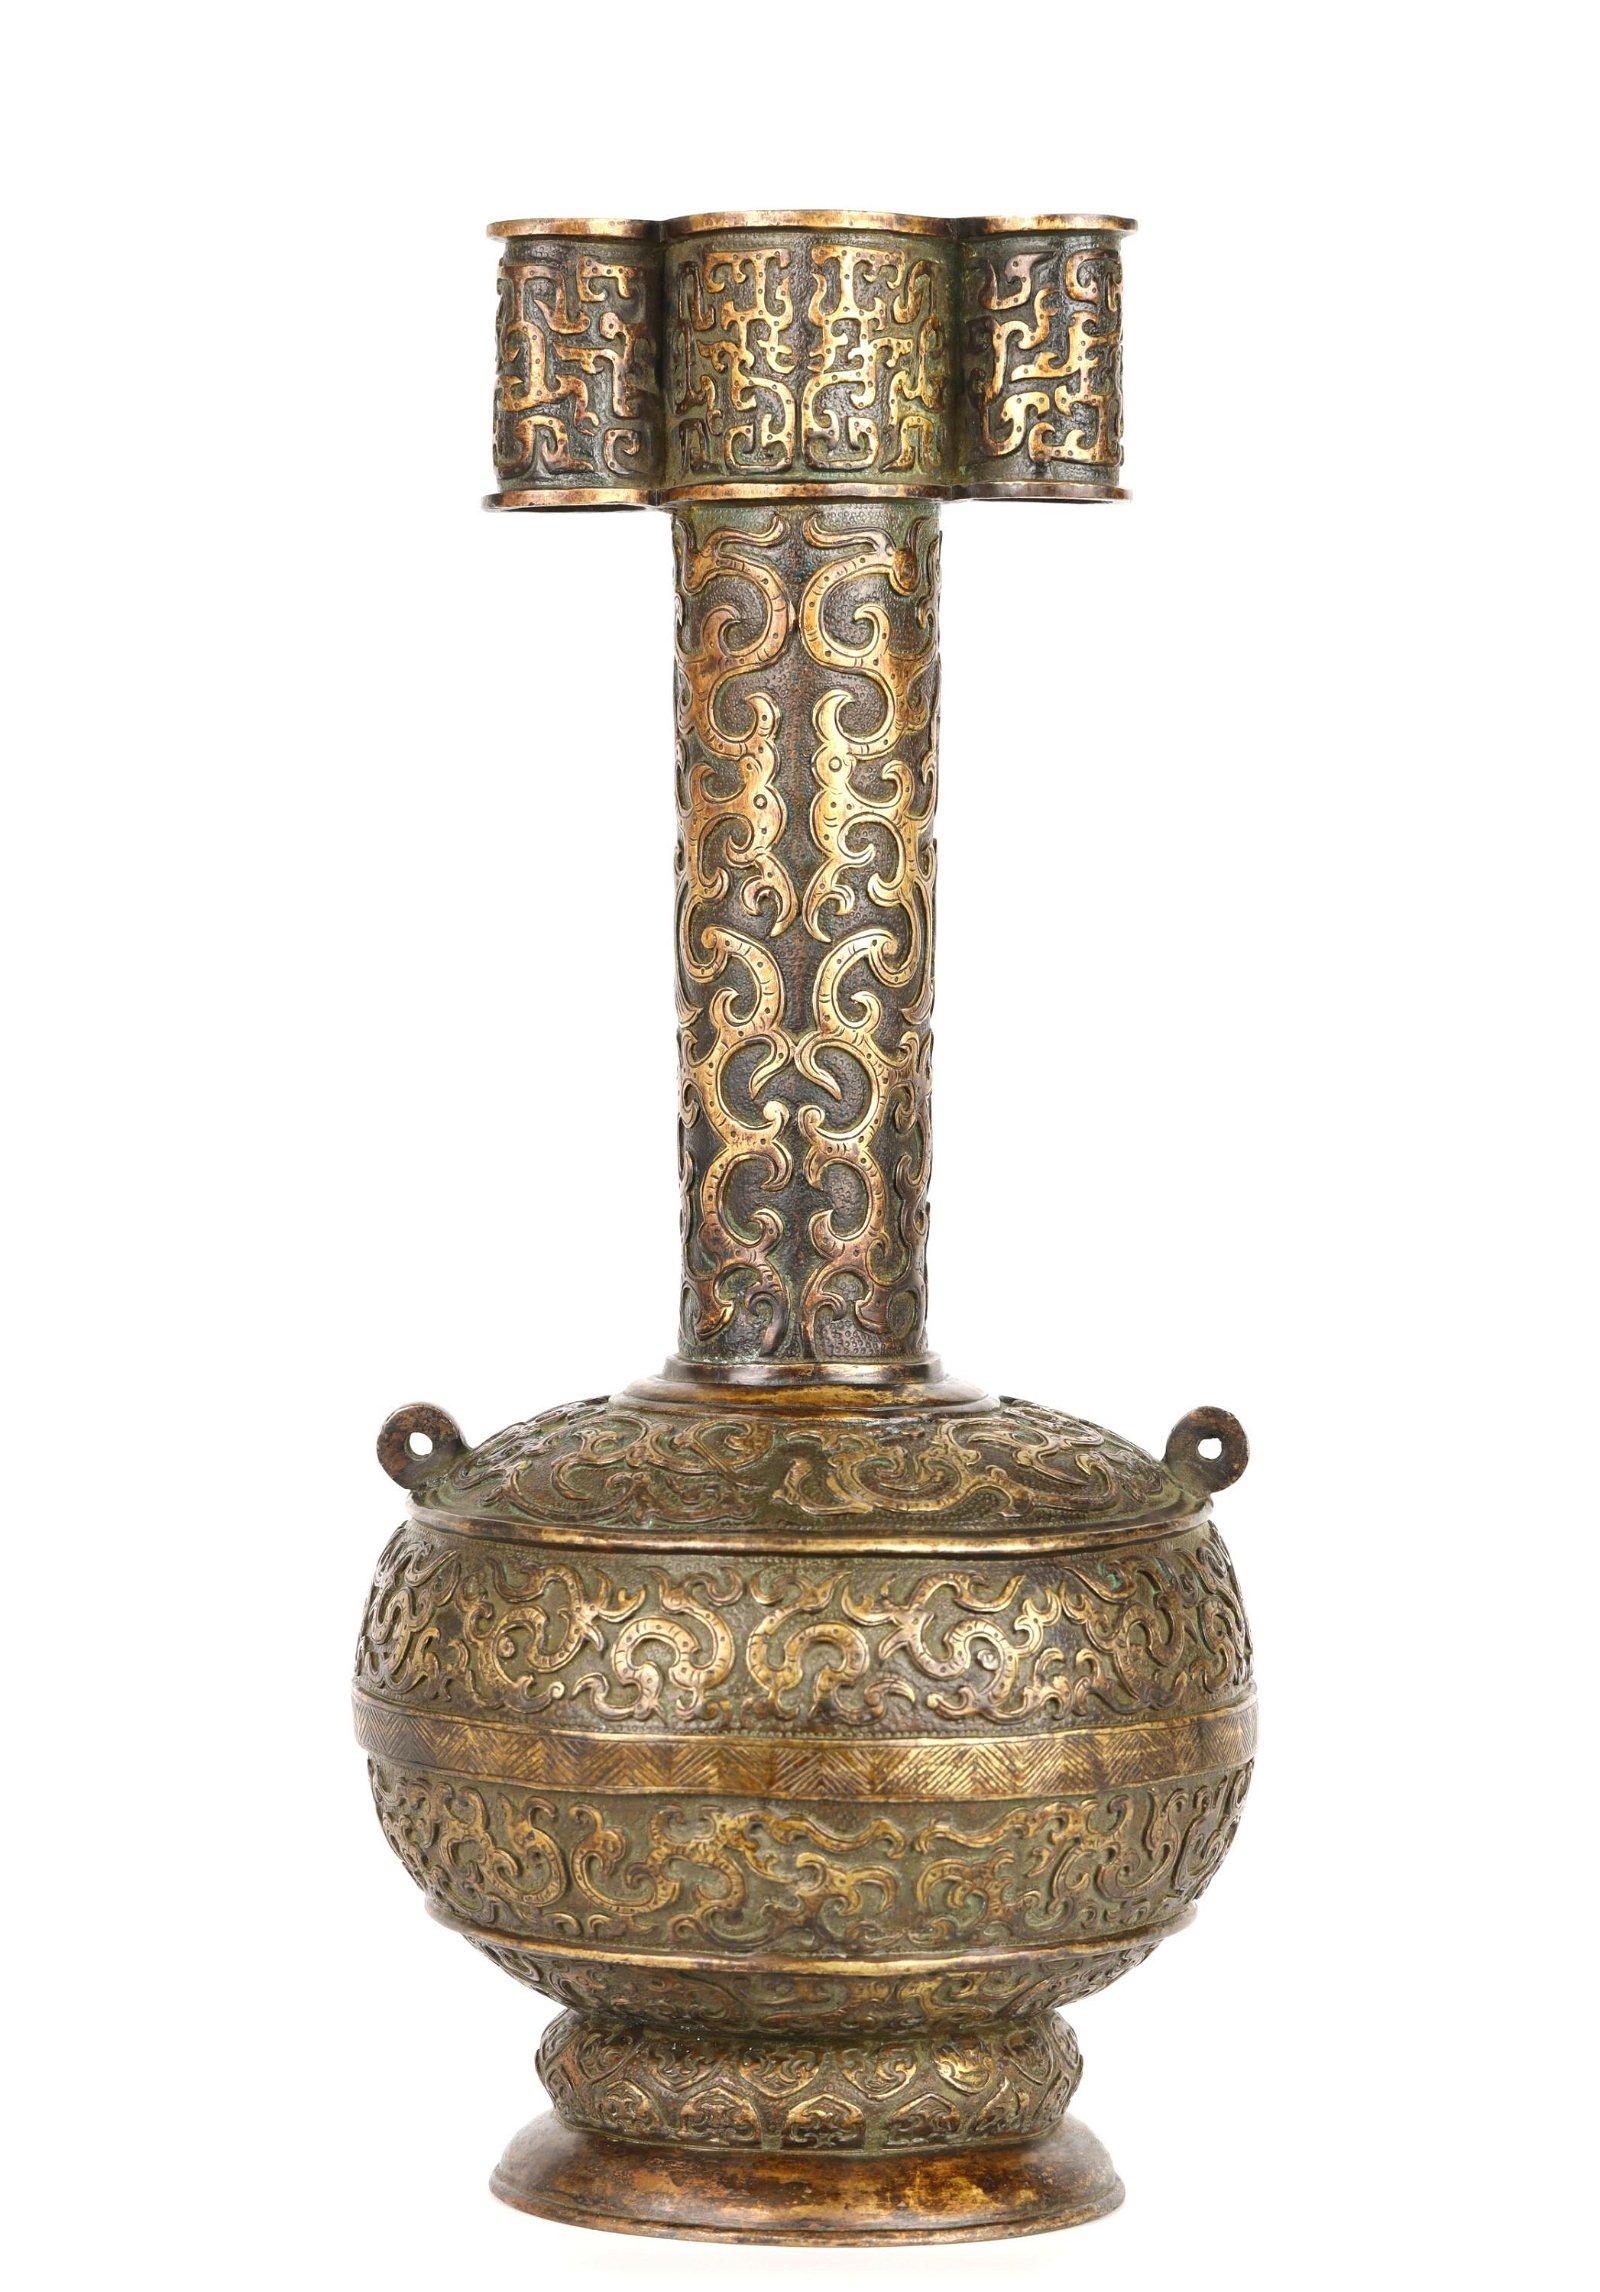 Qing dynasty. Chinese Bronze Vase